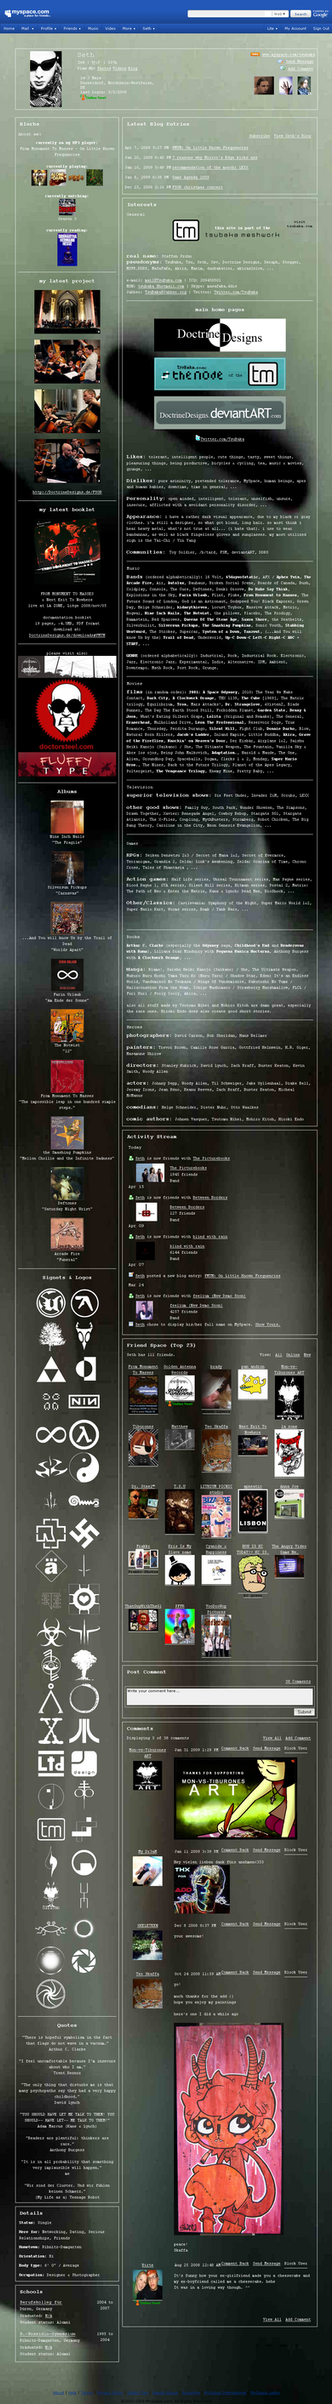 MySpace-dot-com-slash-TsuBaka by DoctrineDesigns